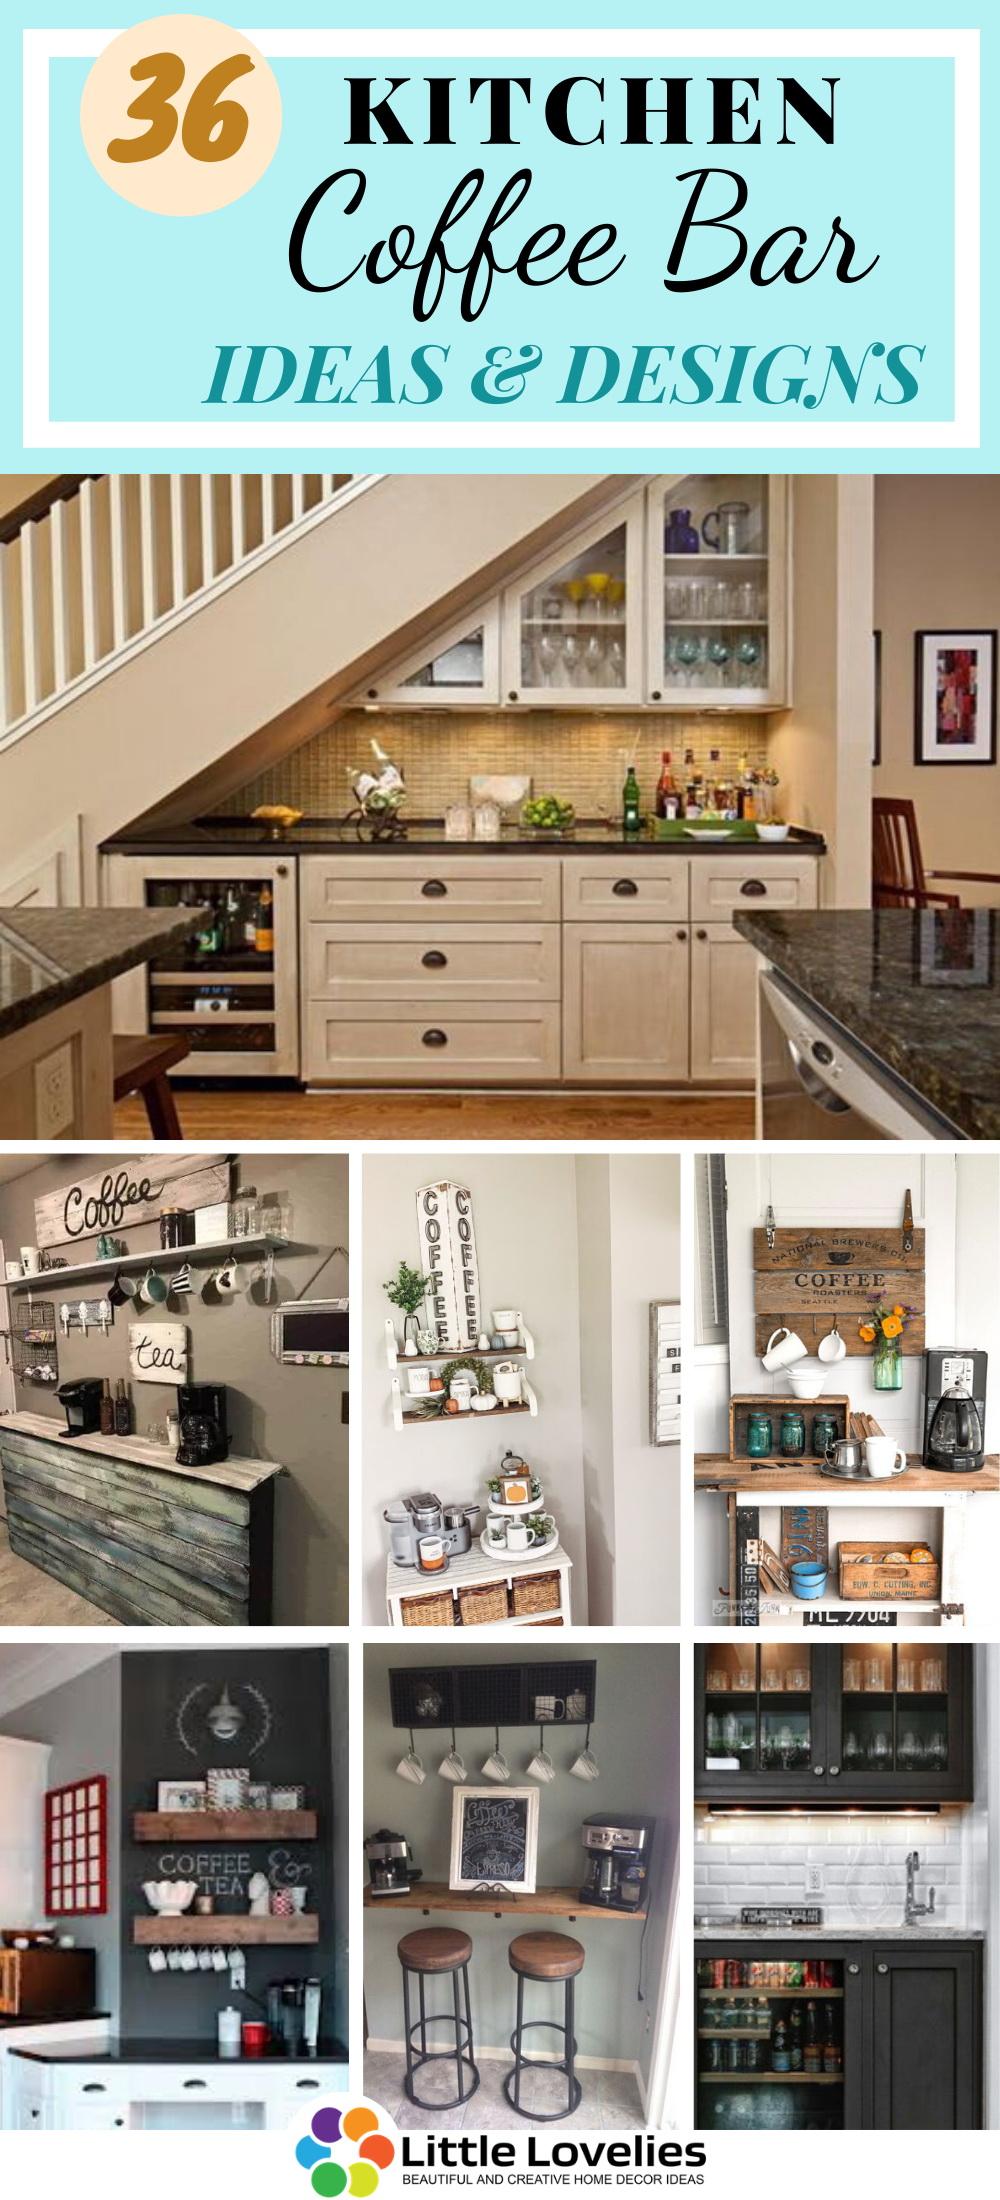 36 kitchen coffee bar ideas to organize